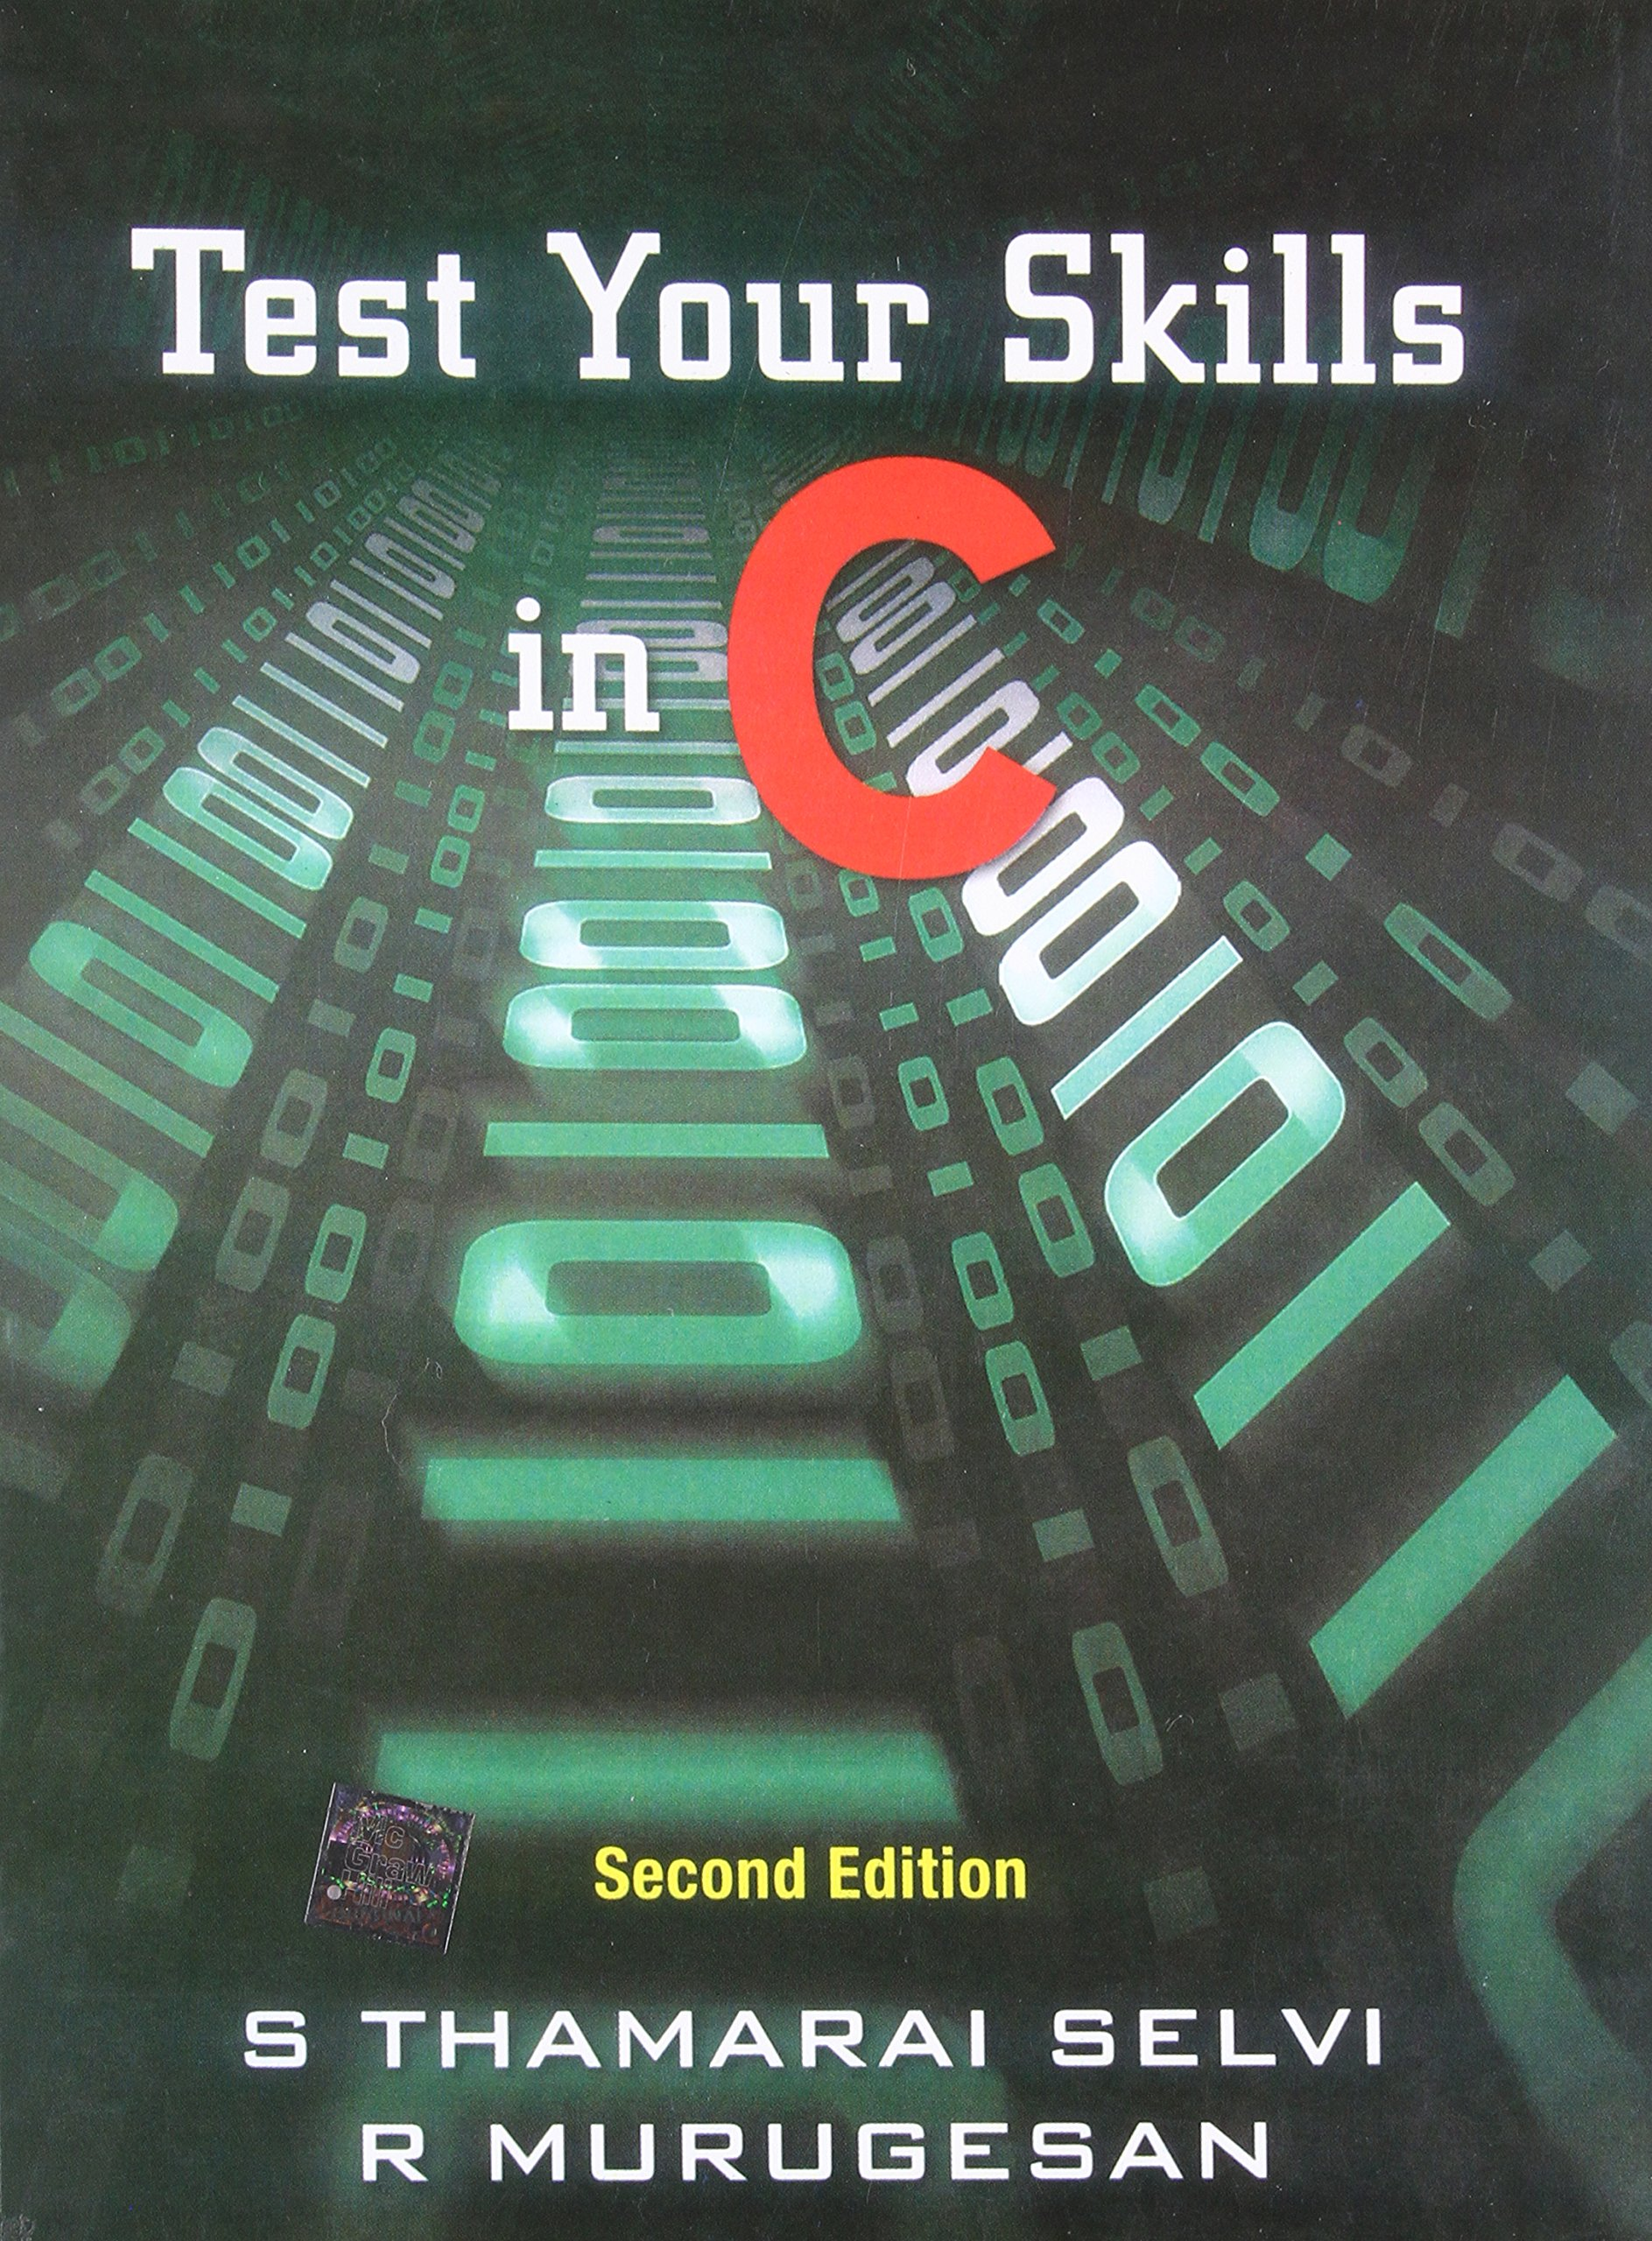 Book skills kanetkar test yashwant your c pdf by